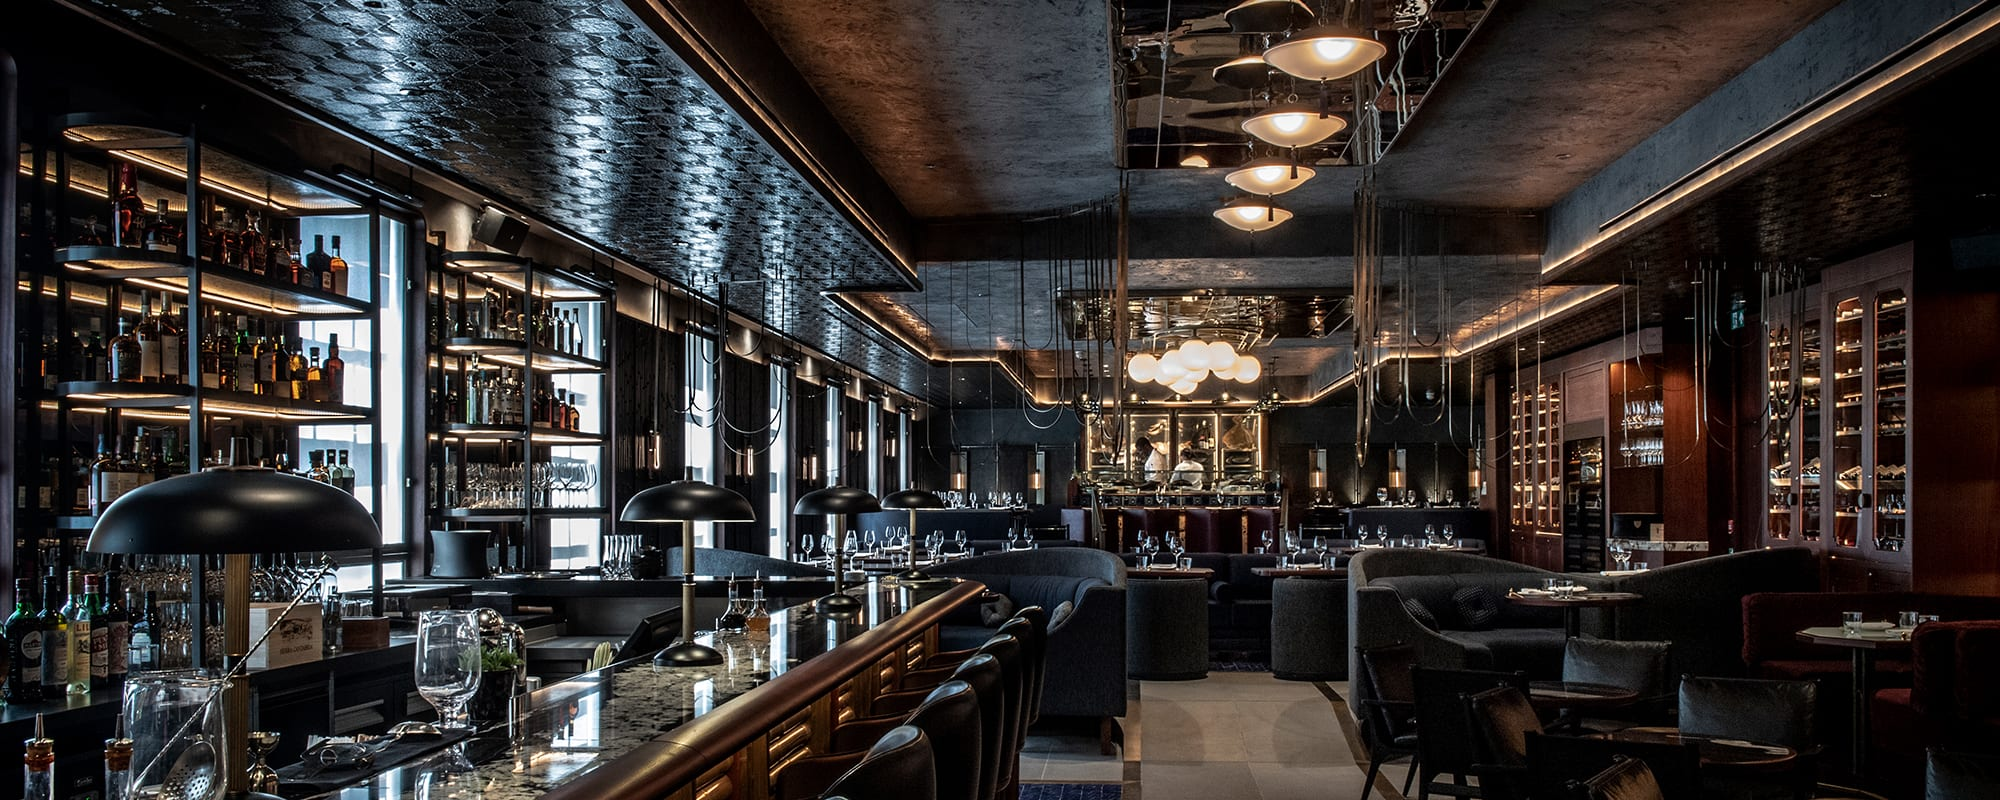 Lucky Cat, Design, Restaurant, London, Gordon Ramsay, AfroditiKrassa